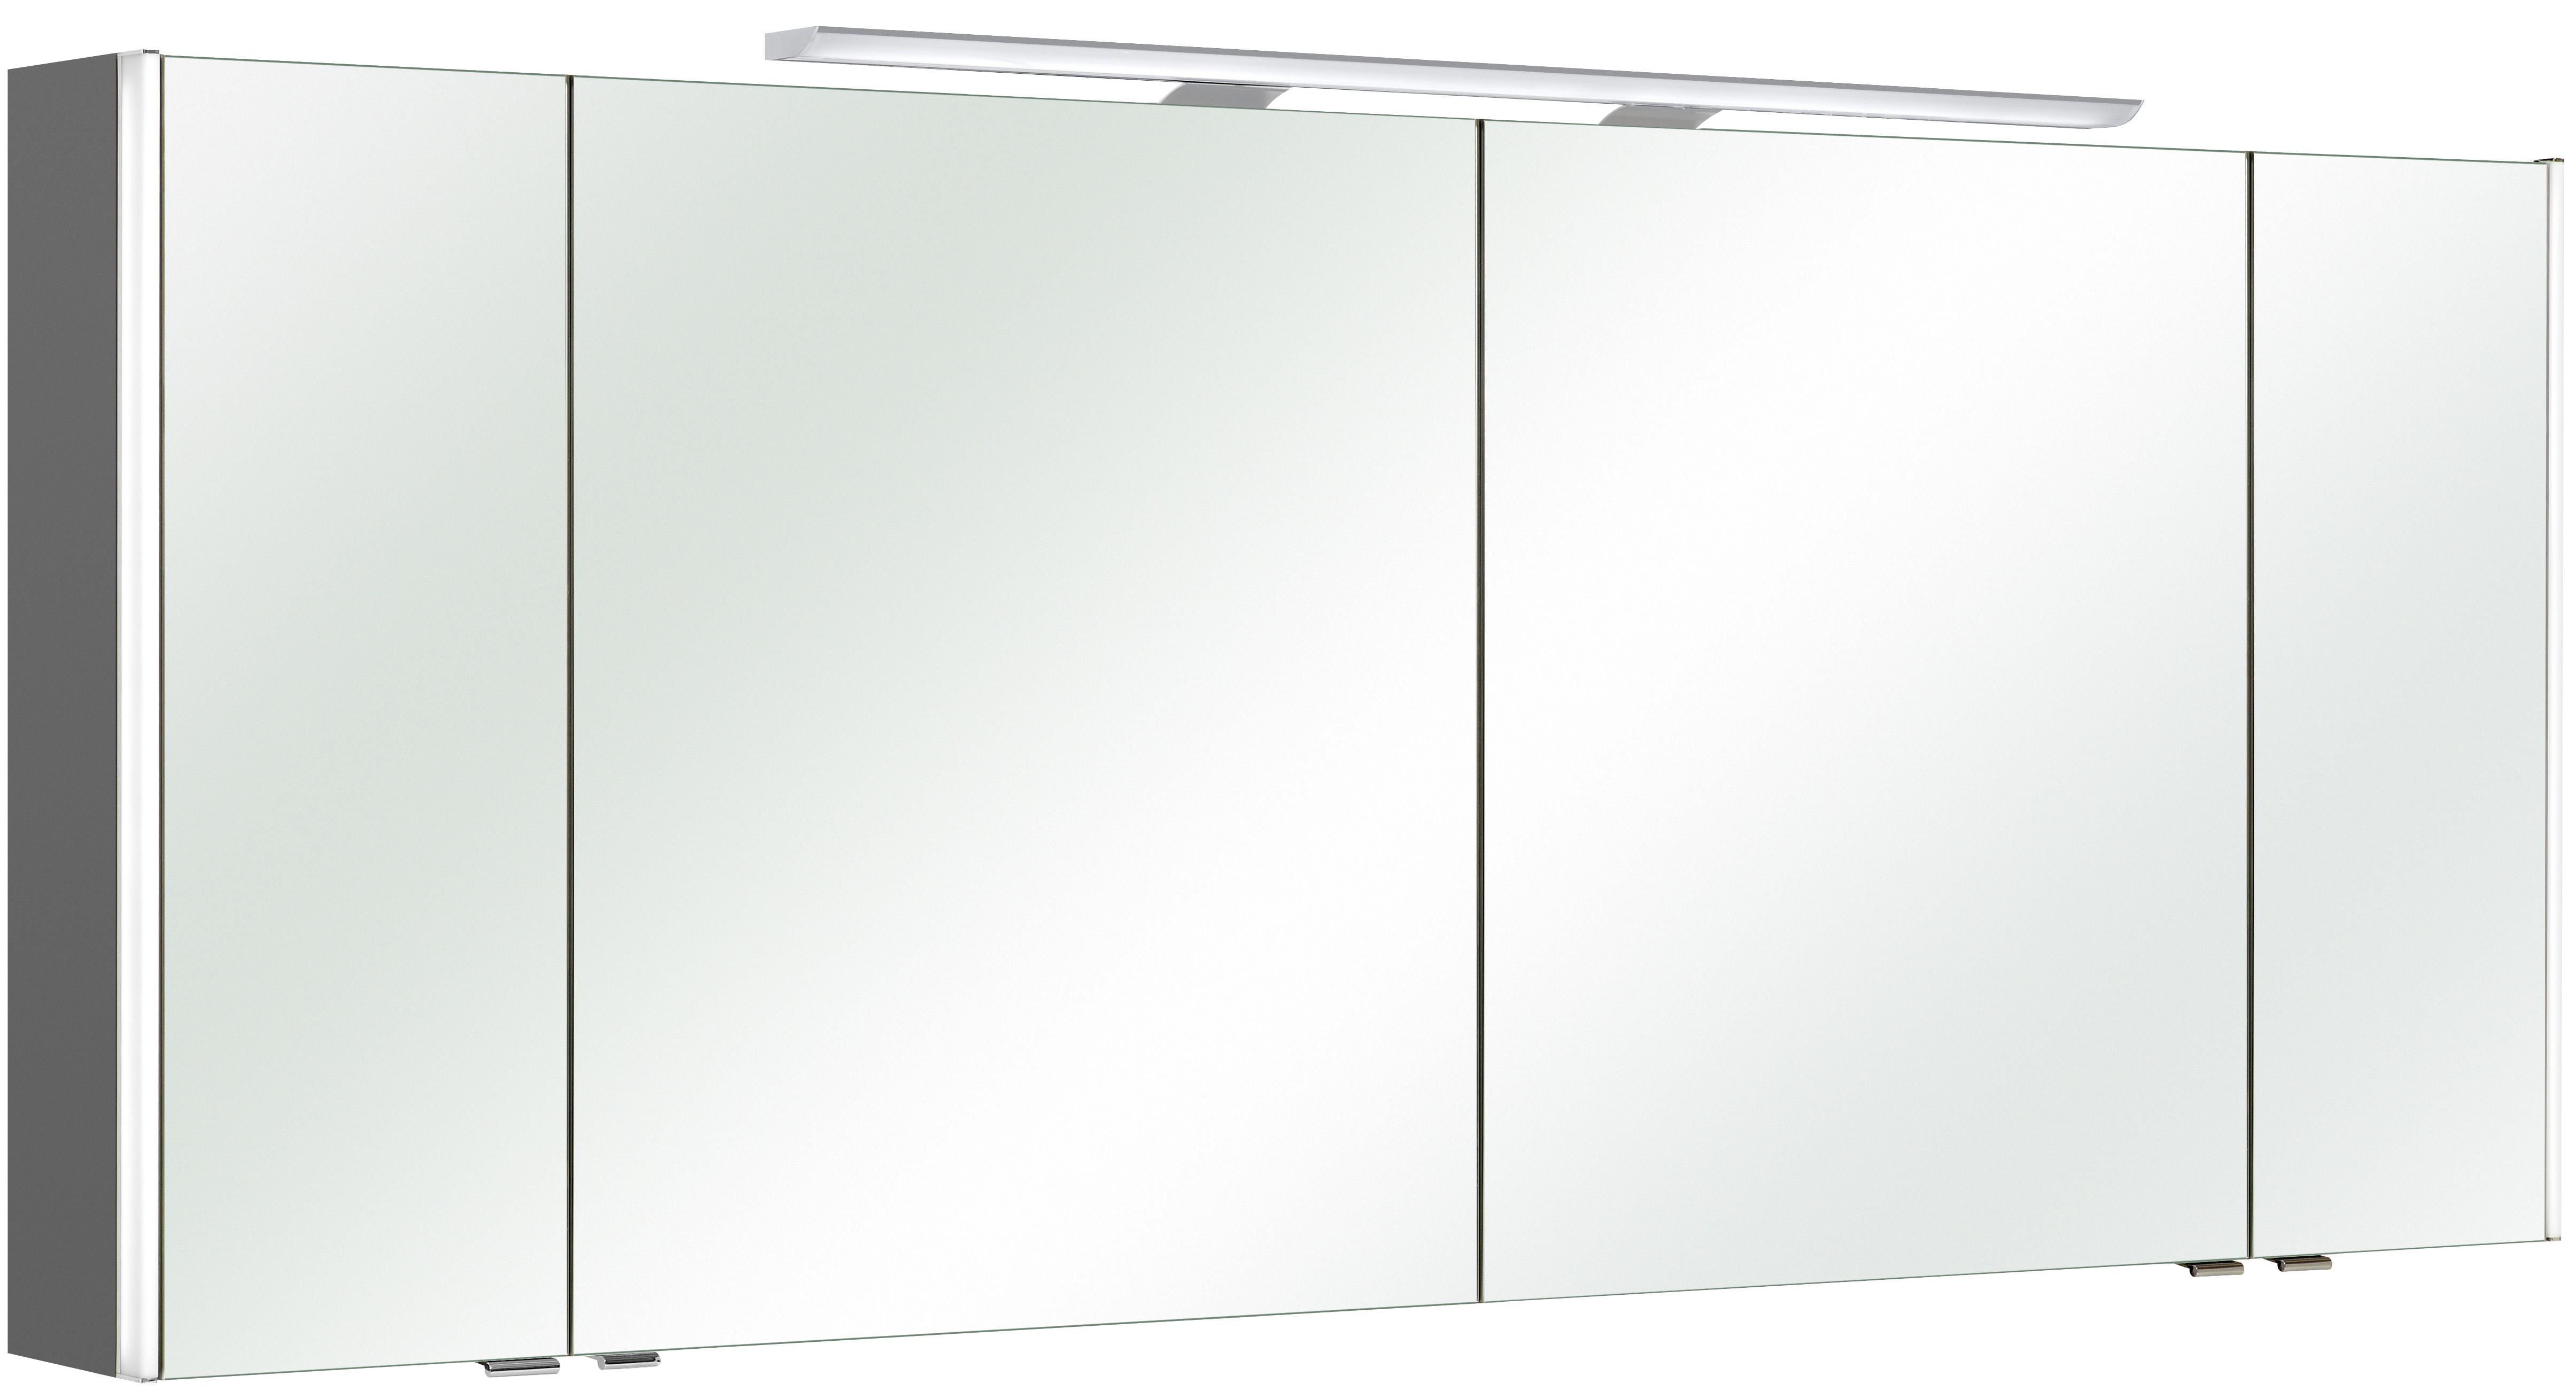 pelipal neutrale spiegelschr nke pelipal badm bel bad prokira k che bad mehr. Black Bedroom Furniture Sets. Home Design Ideas